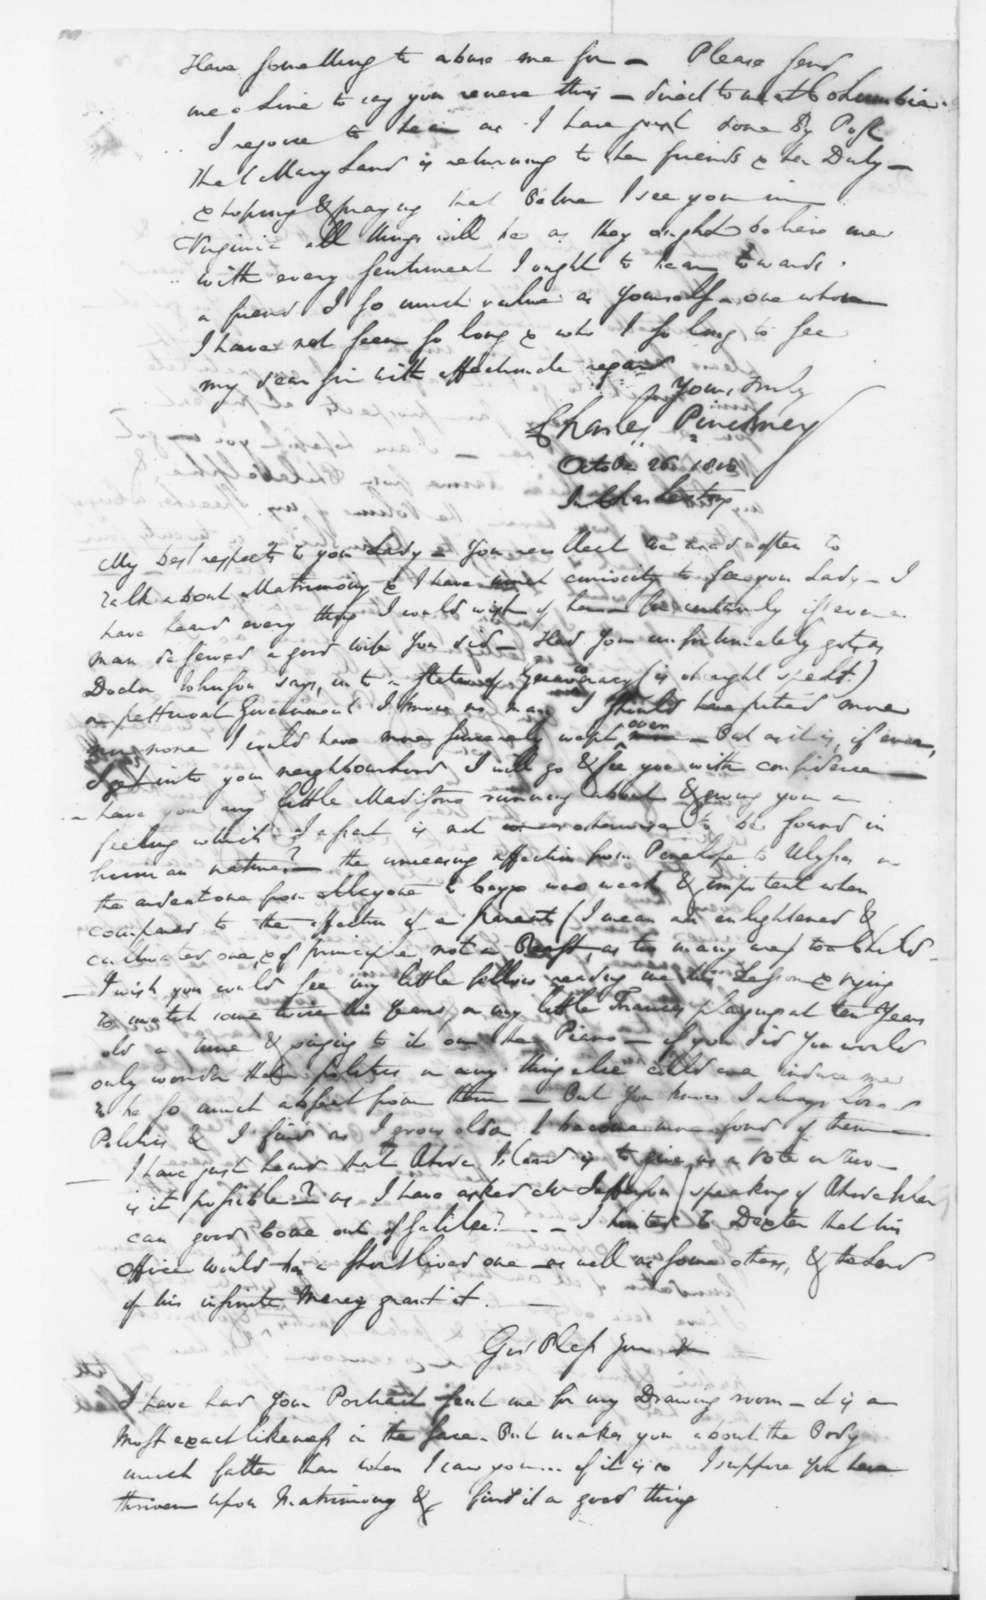 Charles Pinckney to James Madison, October 26, 1800.